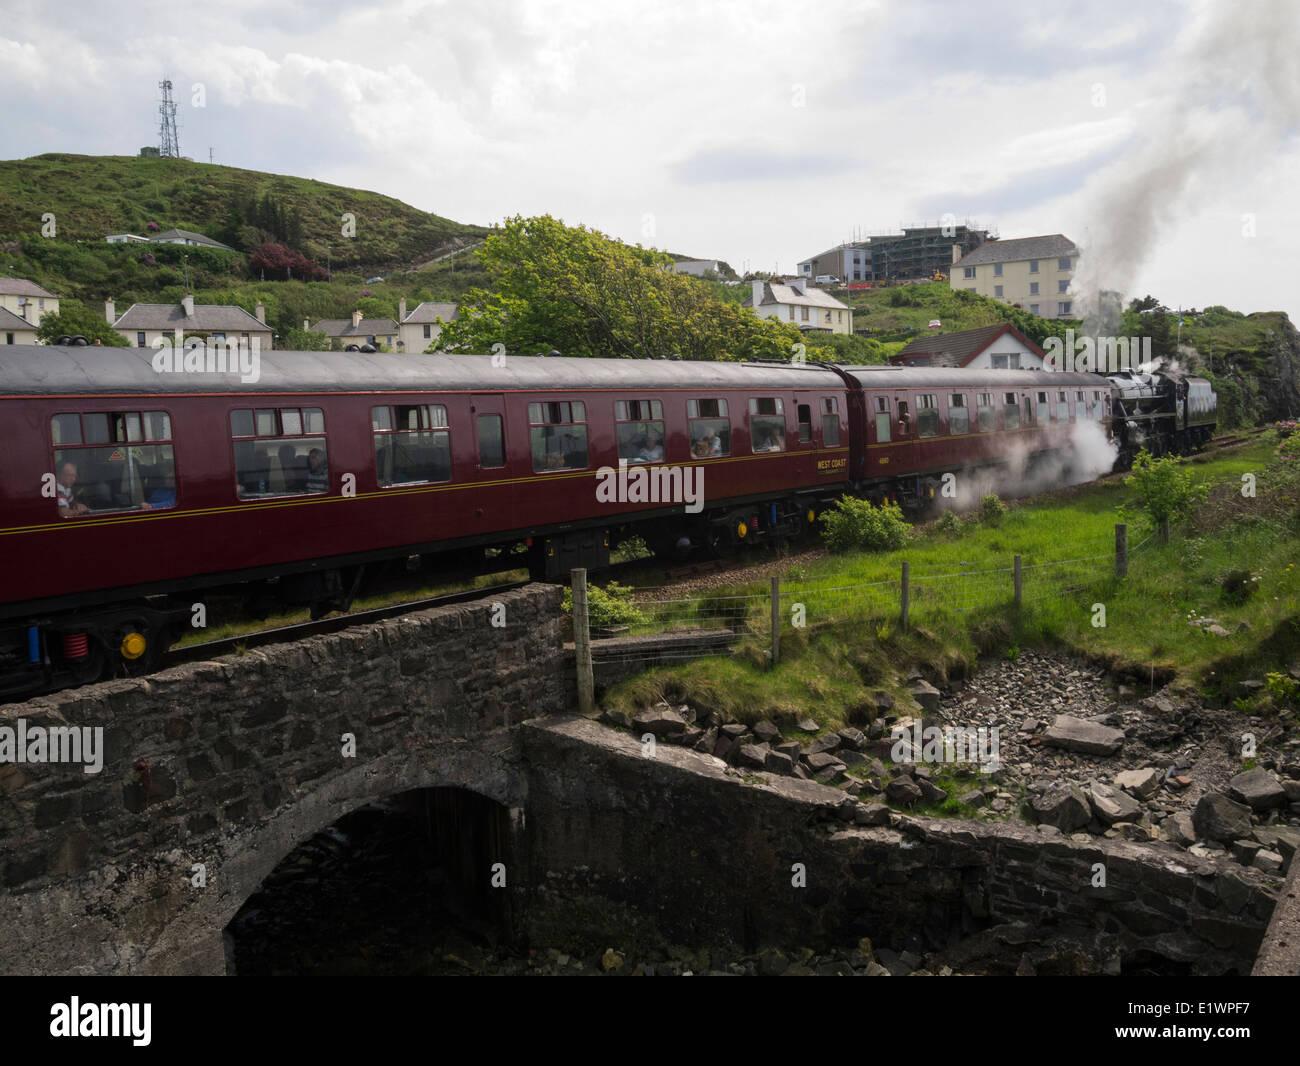 Iconic Jacobite steam train the Lancashire Fusilier leaving Mallaig village station Scottish Highlands - Stock Image